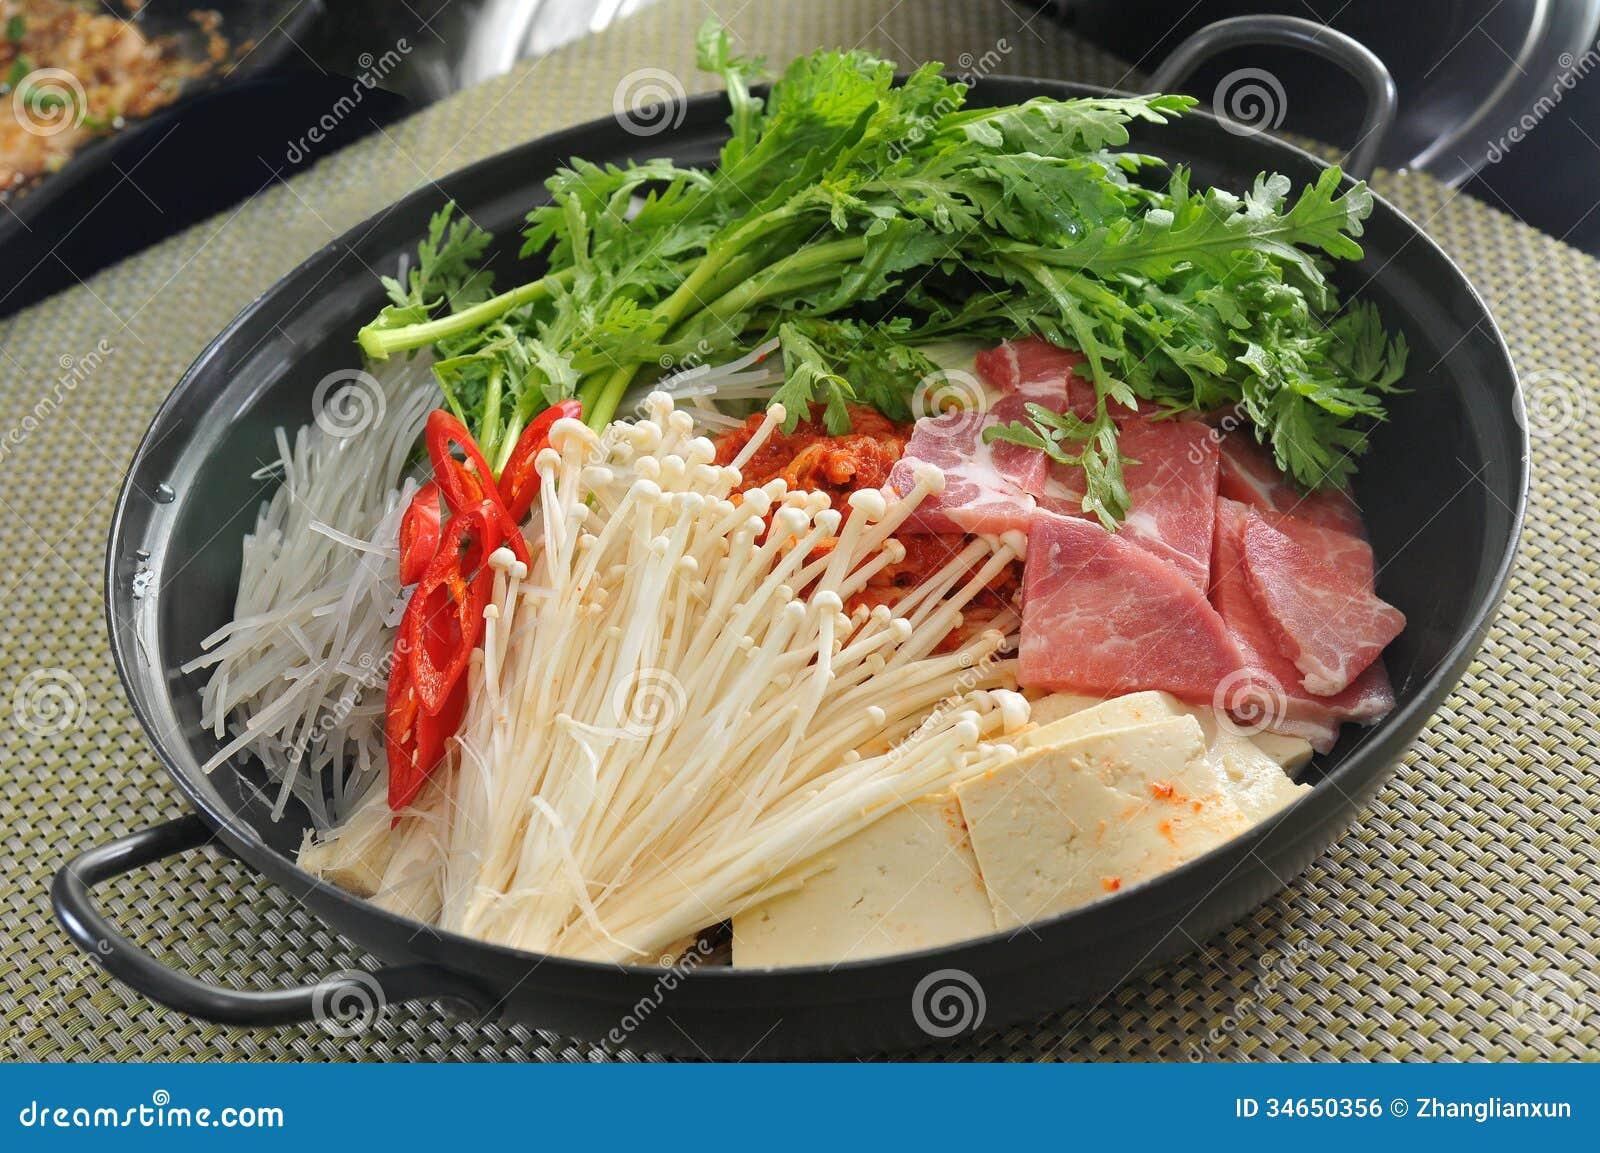 Korean Hot Pot Stock Photo Image Of Food Ethnic Basket